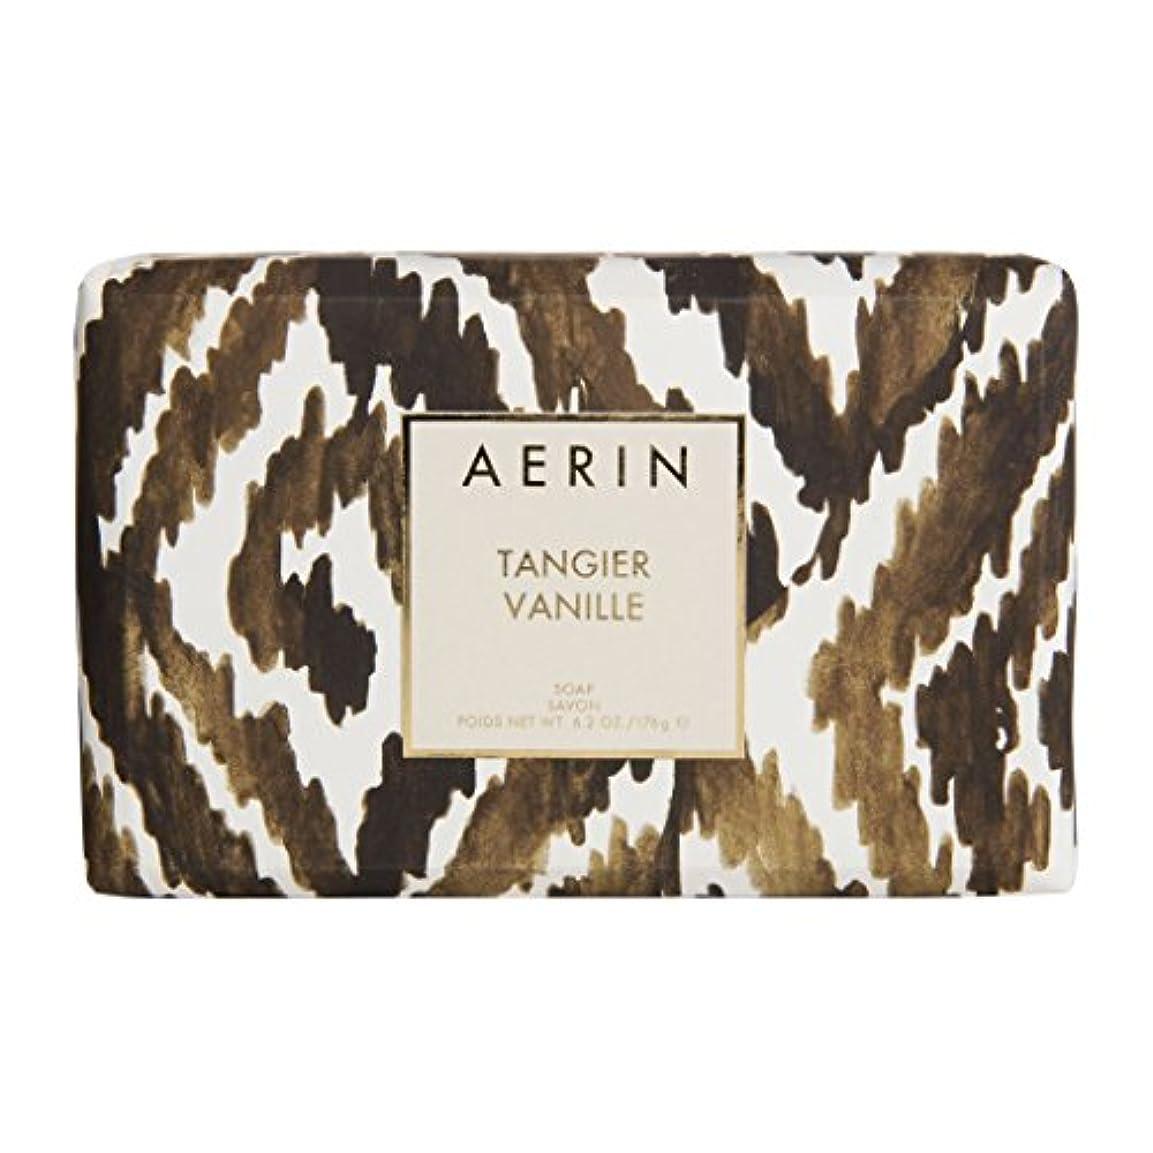 AERIN Tangier Vanille (アエリン タンジヤー バニール) 6.2 oz (186ml) Soap 固形石鹸 by Estee Lauder for Women